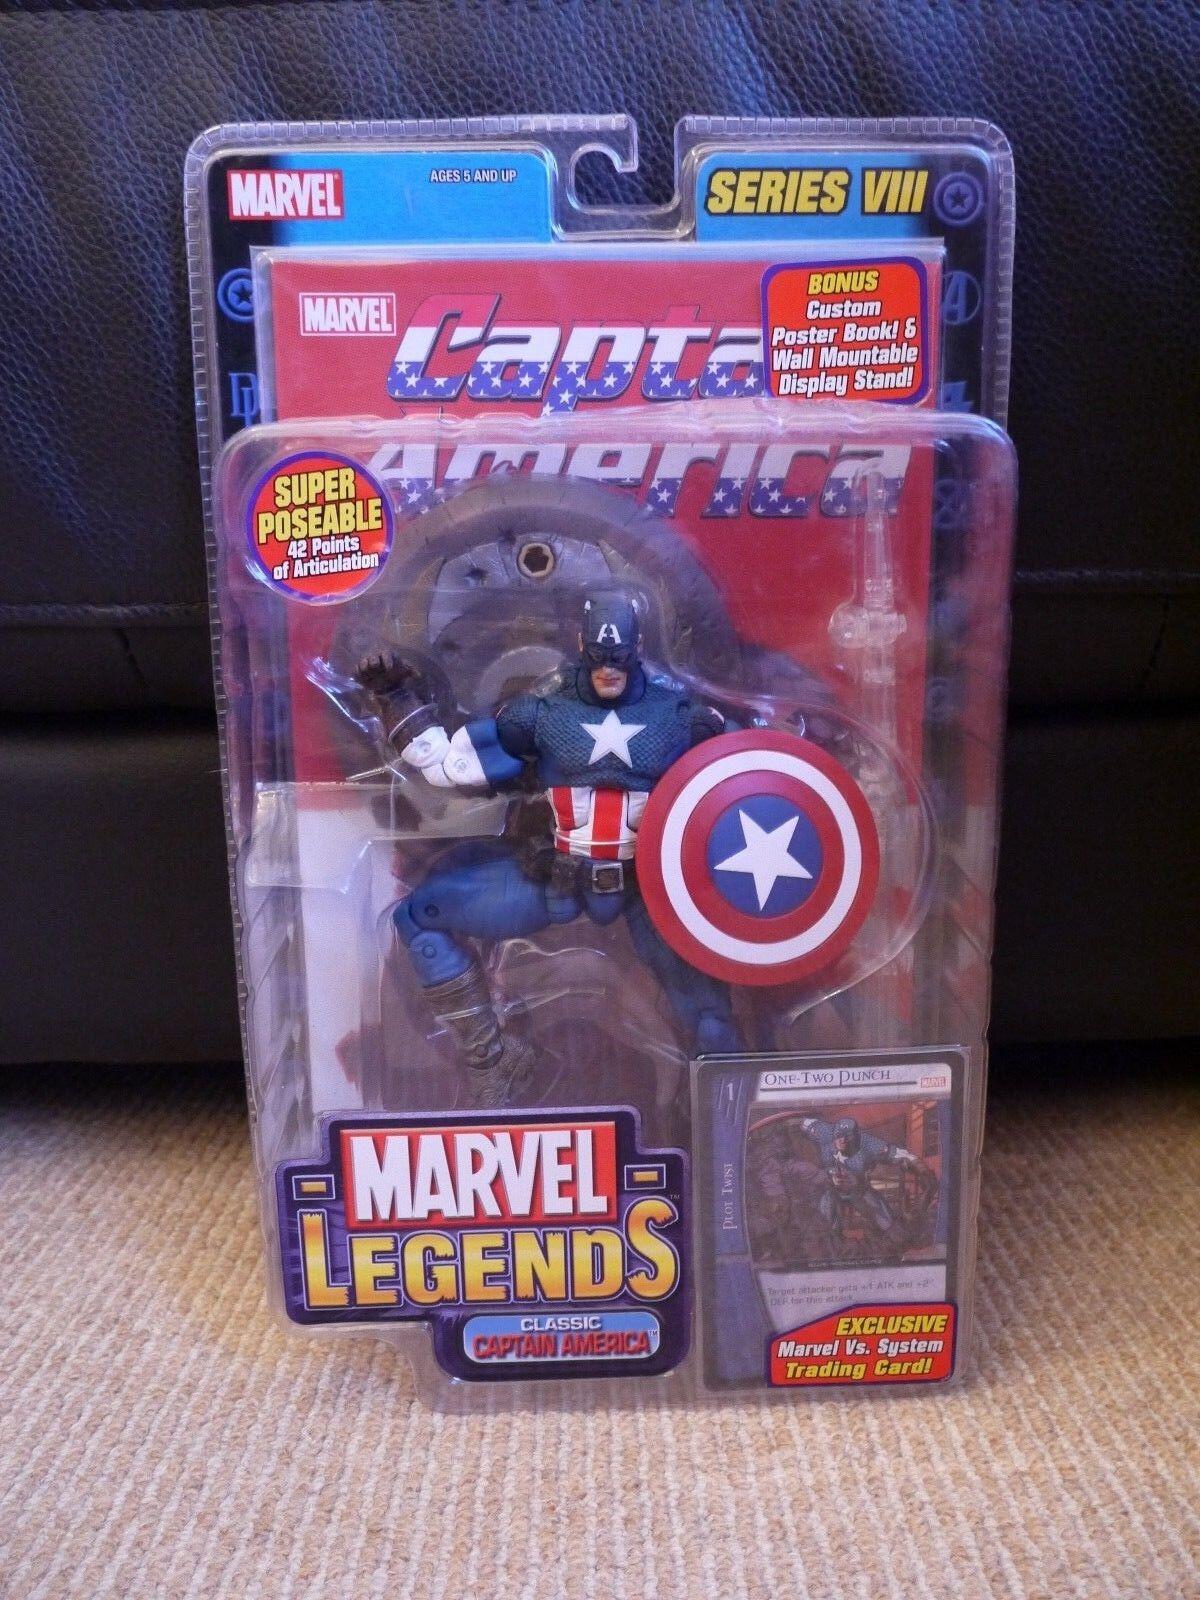 Marvel Legends SERIES VIII 8 Classic Captain America avec ailes variante Toy Biz